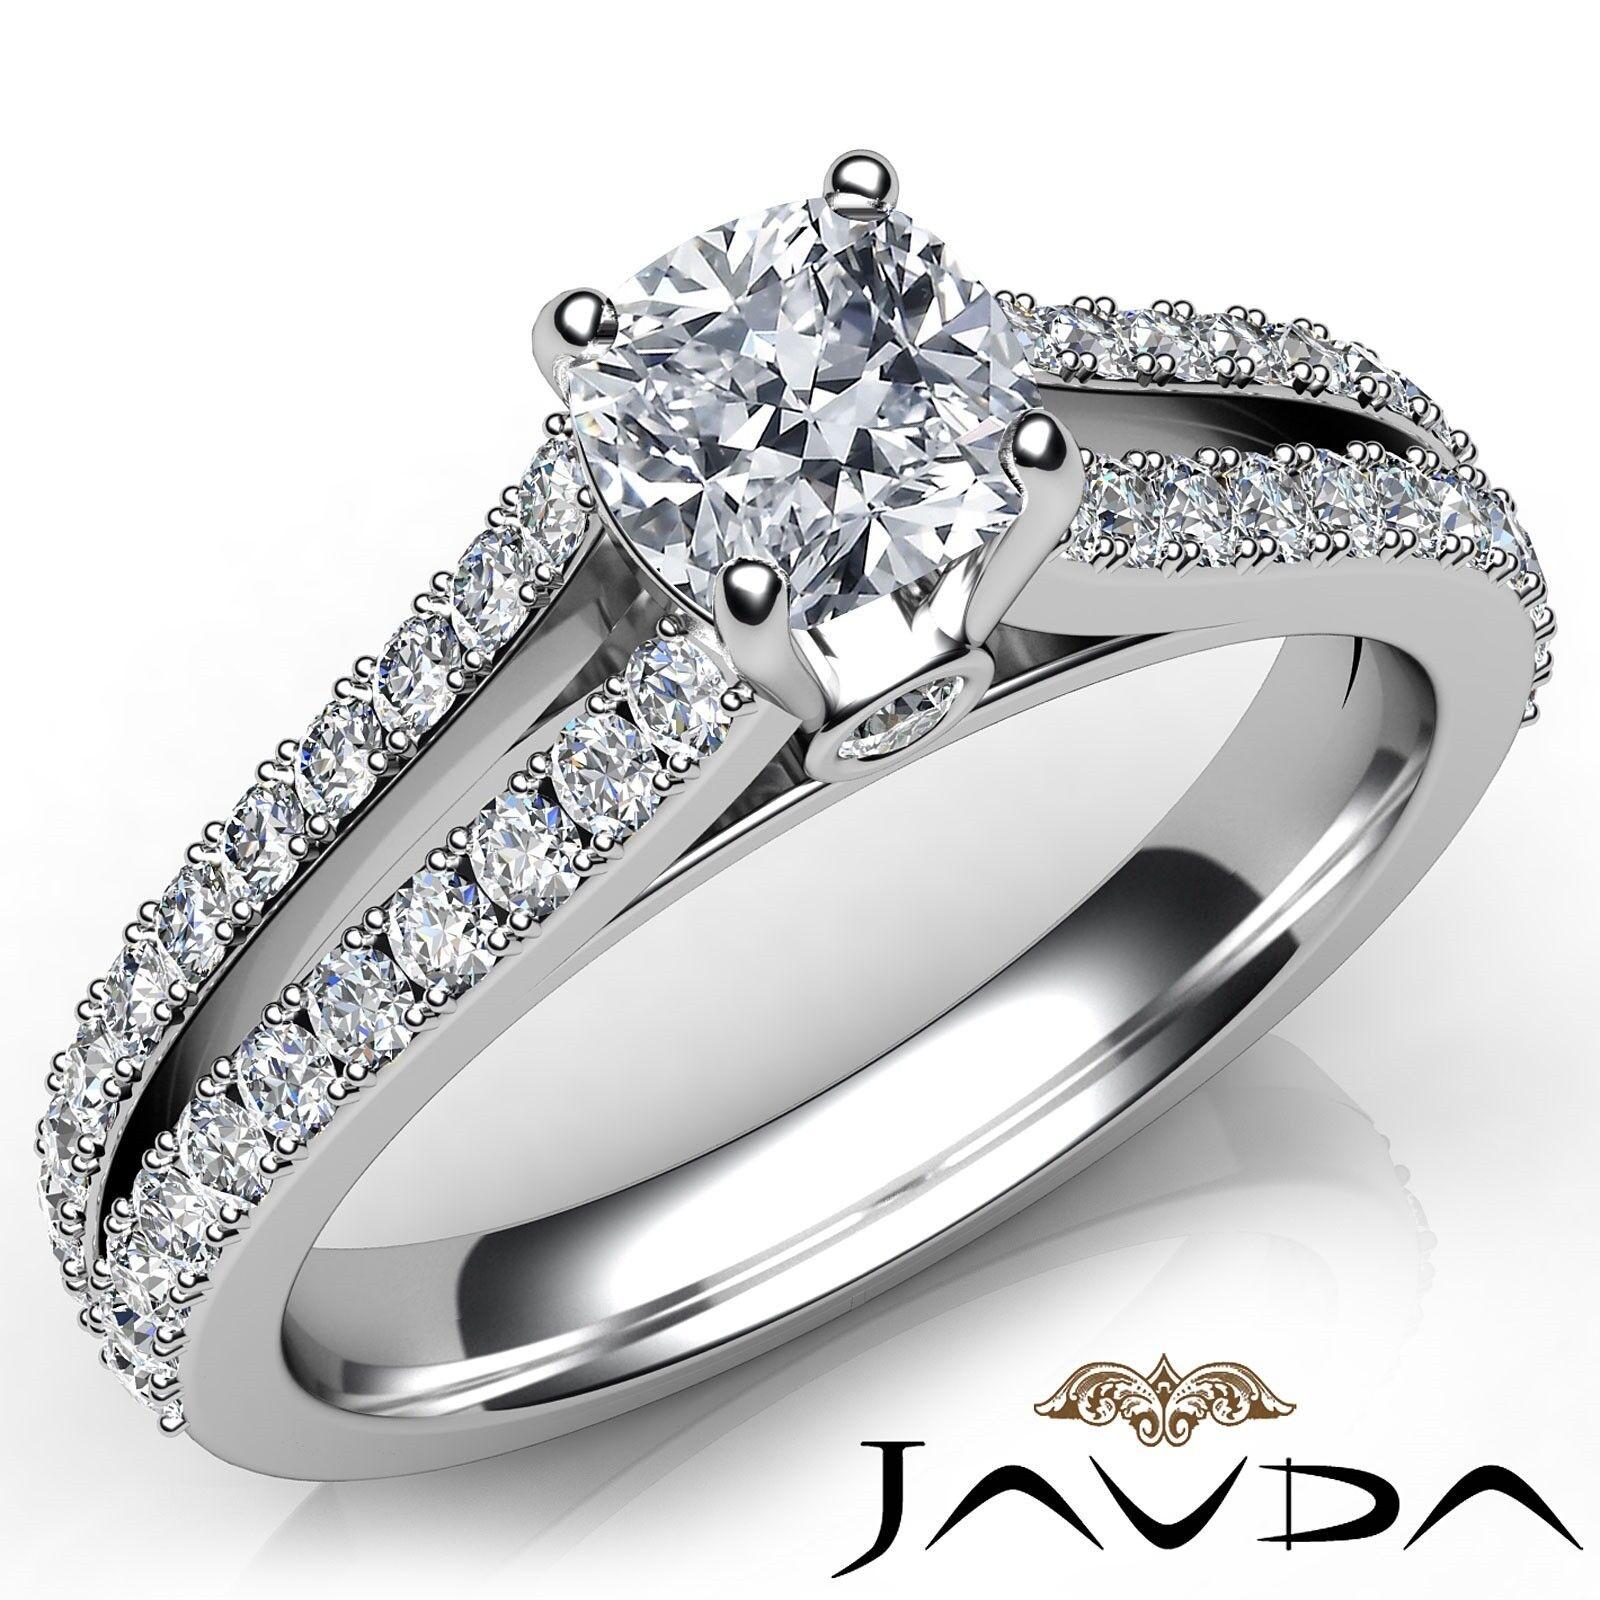 1.29ctw Double Prong Split Shank Cushion Diamond Engagement Ring GIA H-VS2  Gold